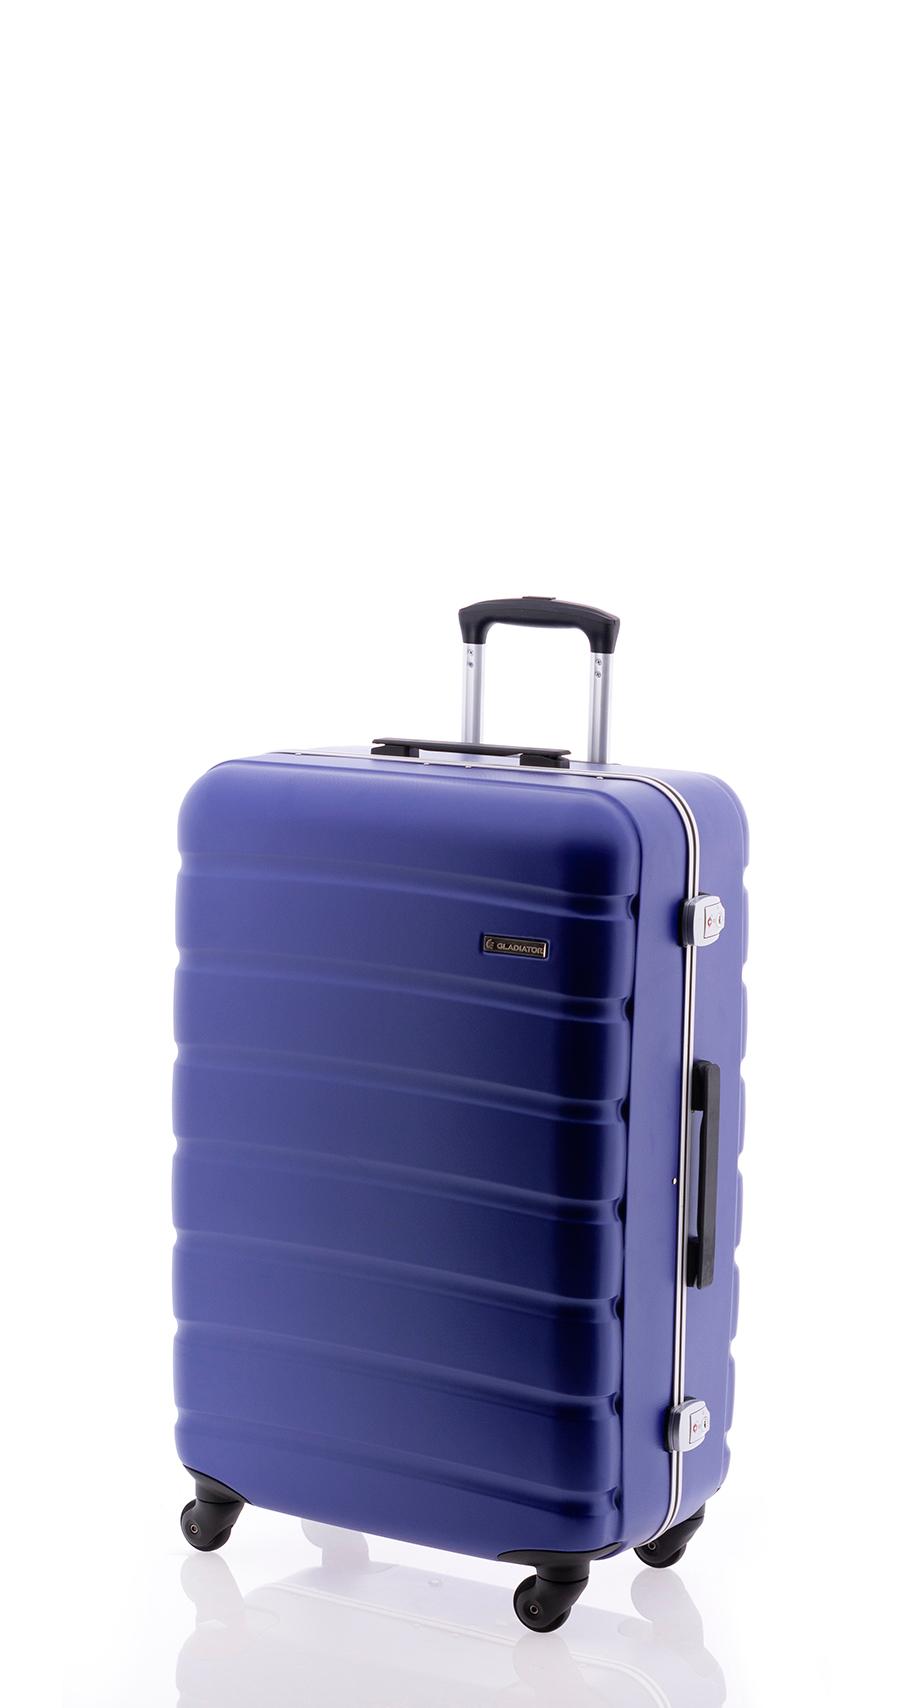 maletas-gladiator-leria-grande-261200